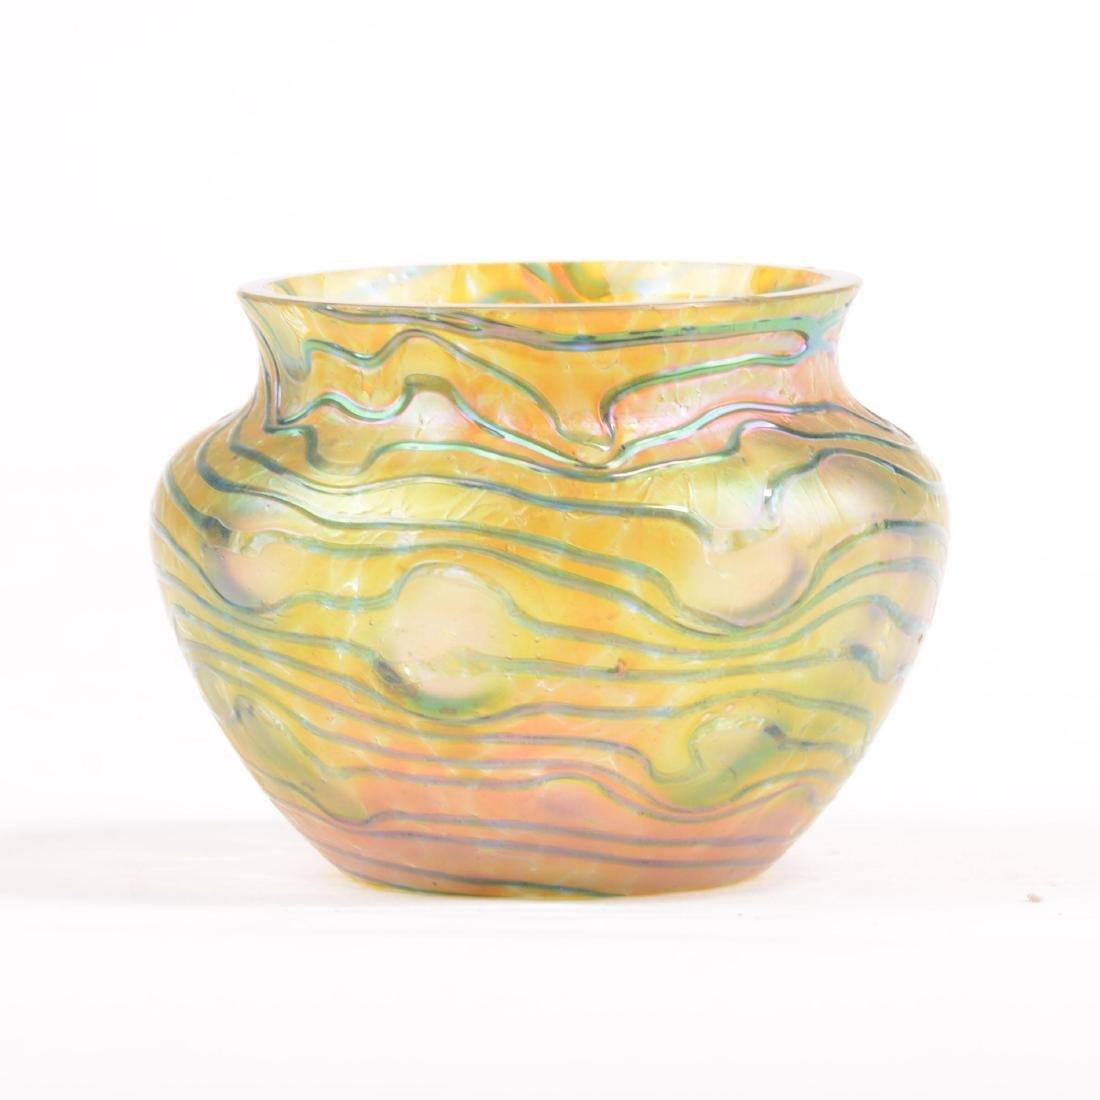 "Vase - Art Glass - 2.5"" X 3.5"""